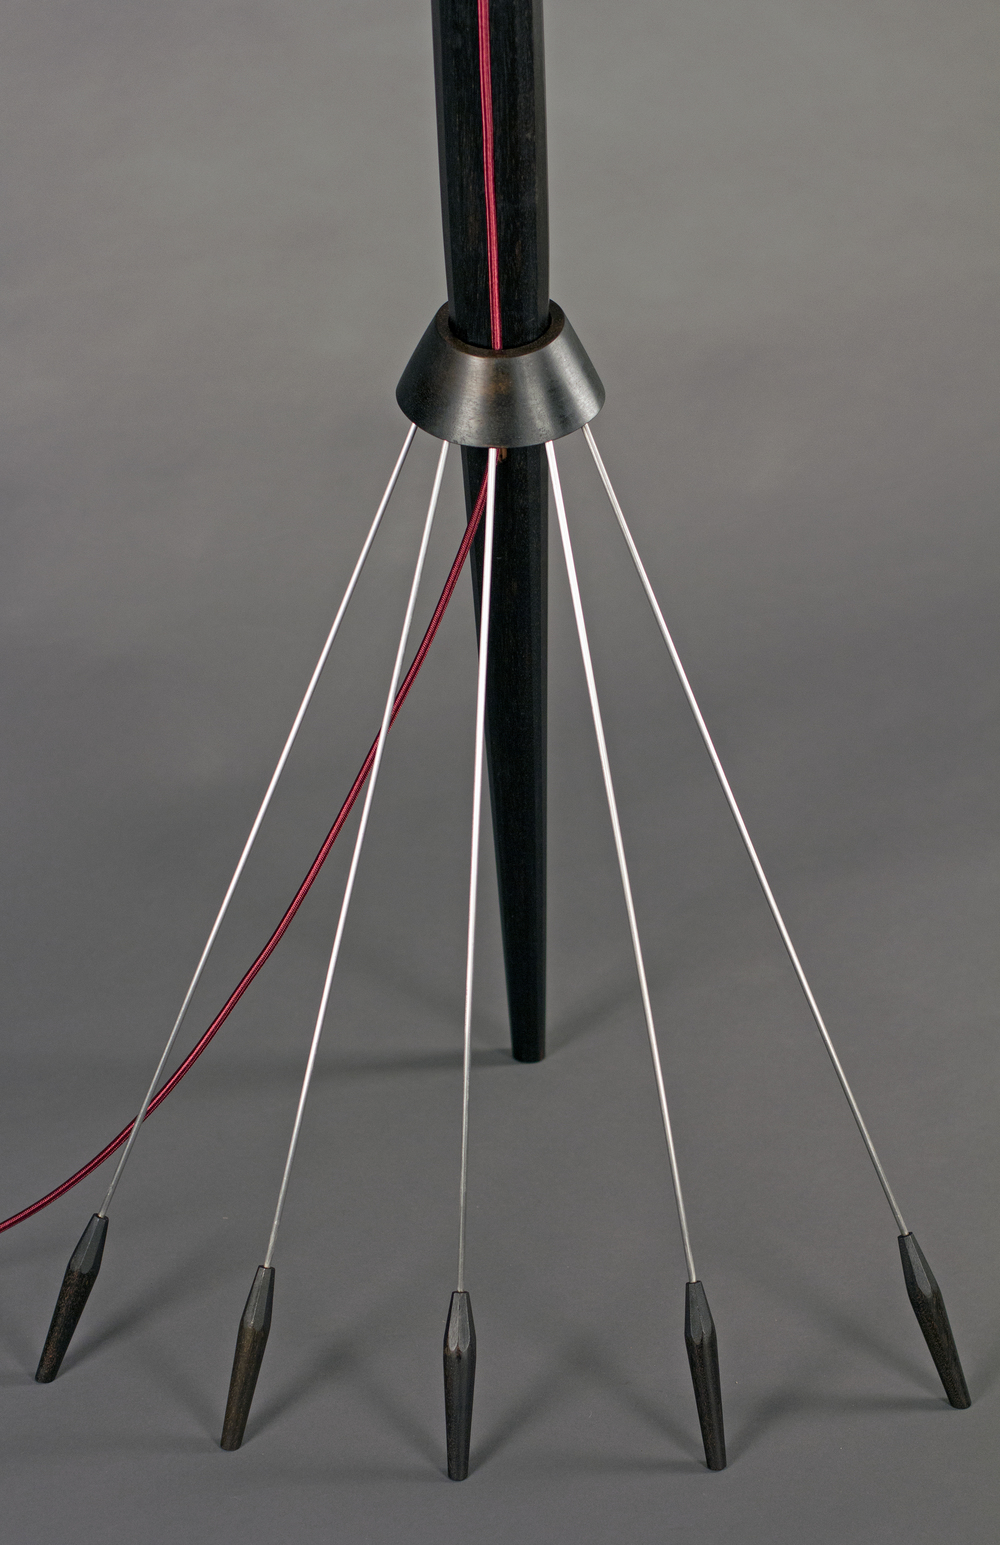 lamp_detail_legs_2.jpg